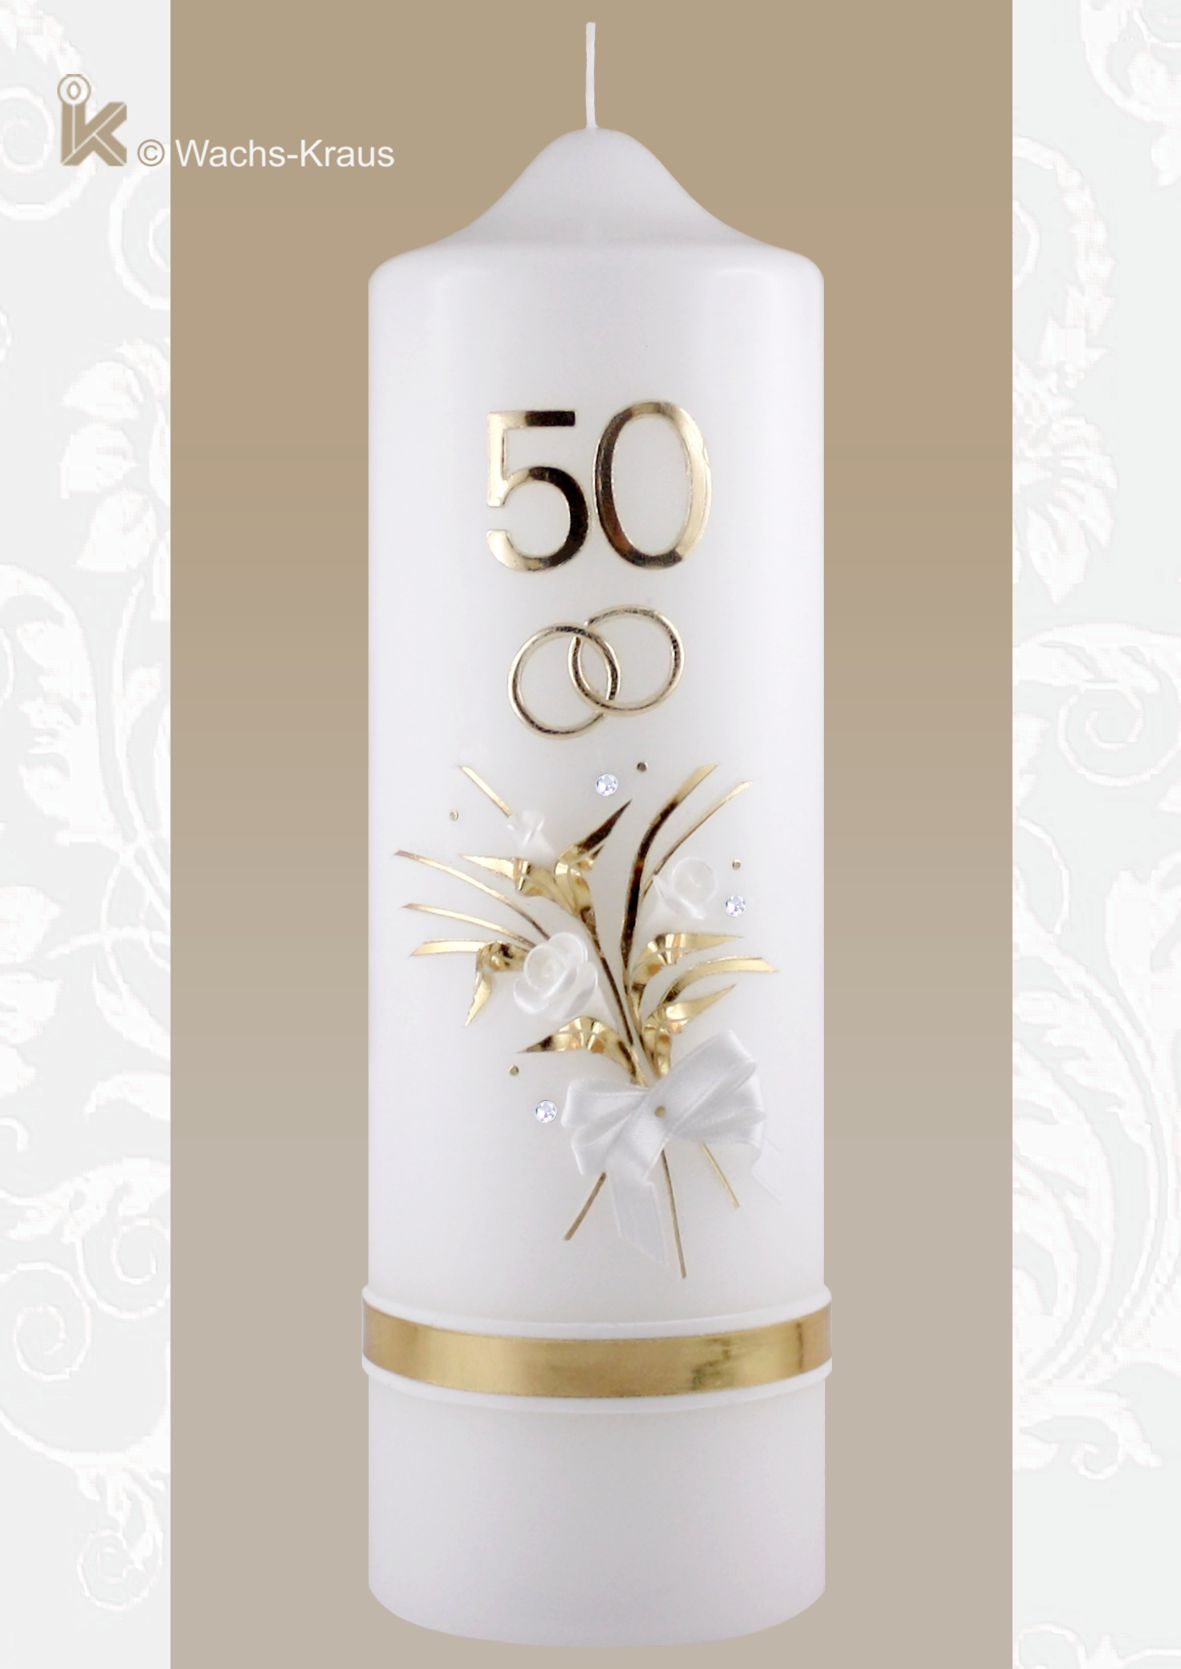 Kerze zum 50 jährigen Ehejubiläum in feinster Handarbeit gestaltet.